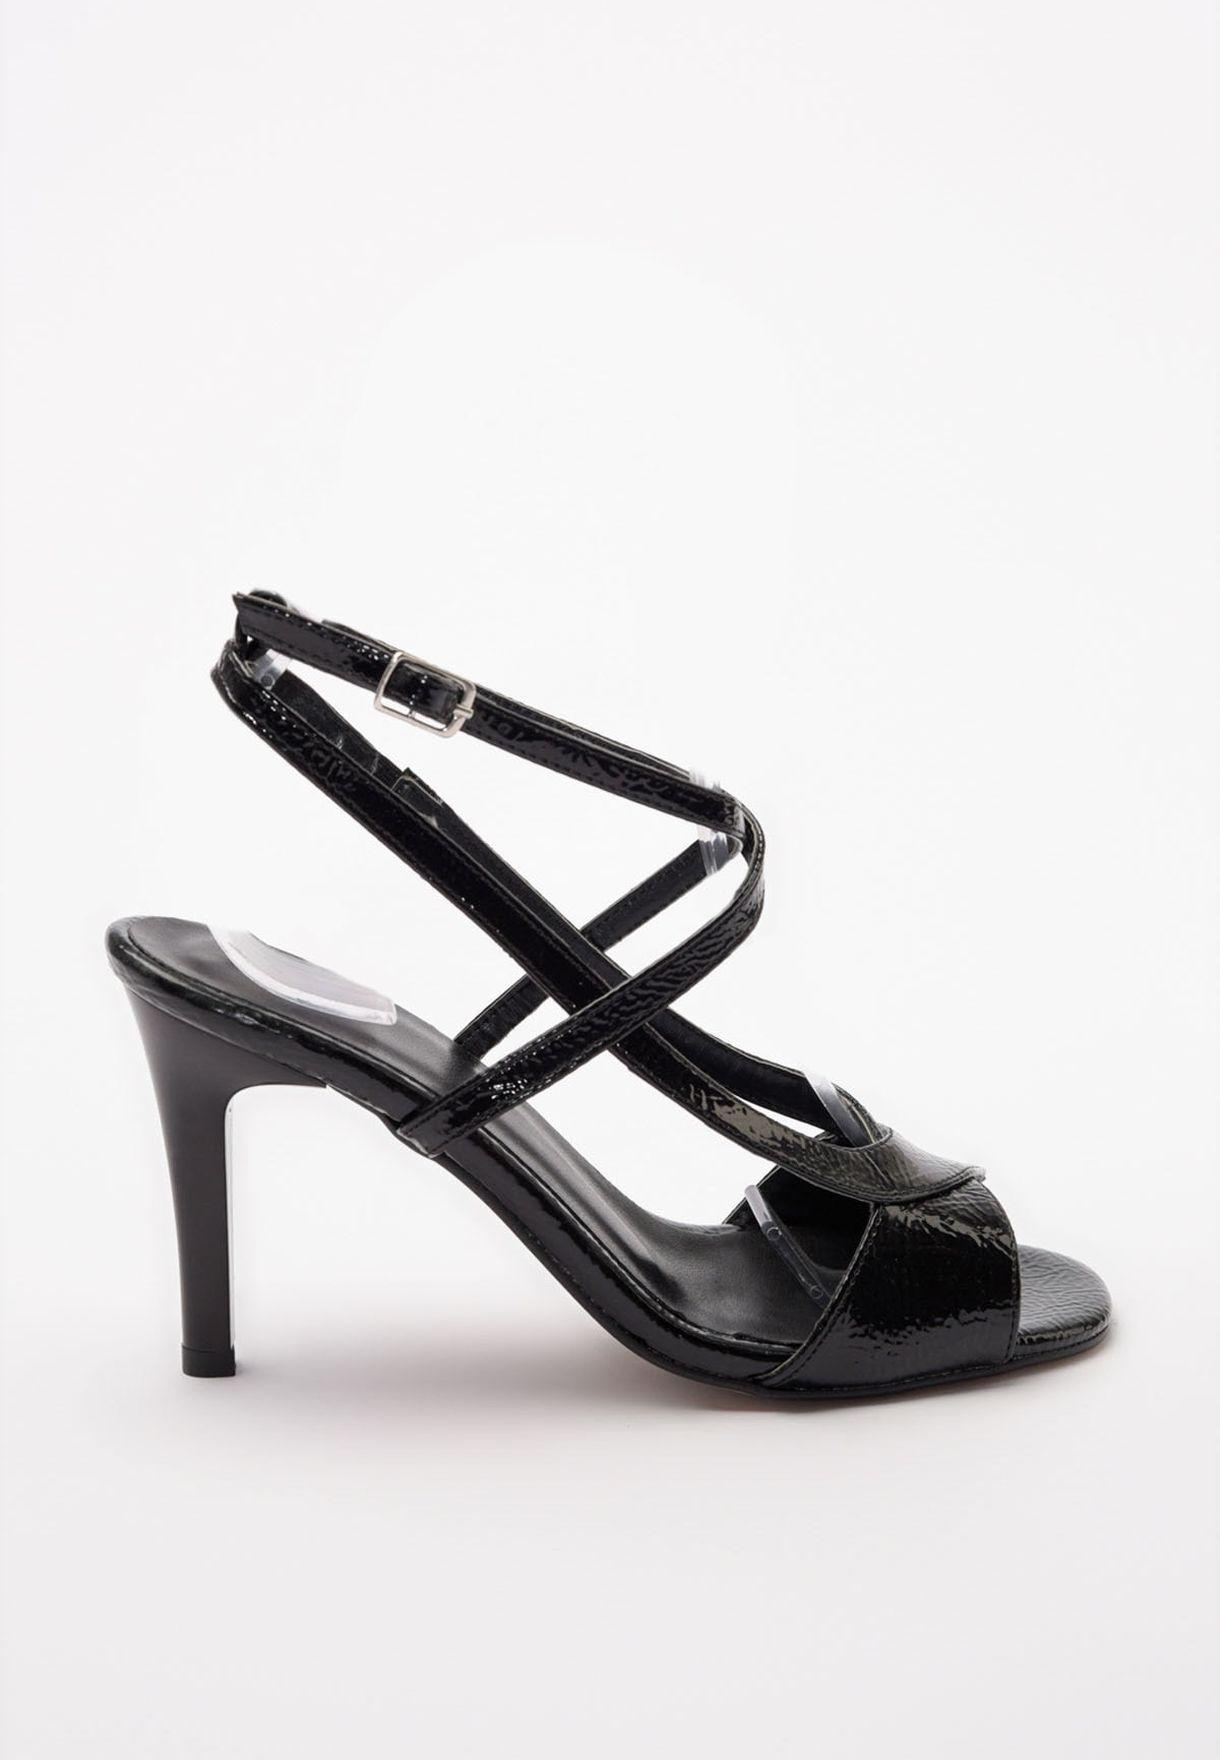 Buckle Detail Cross Strap Sandal